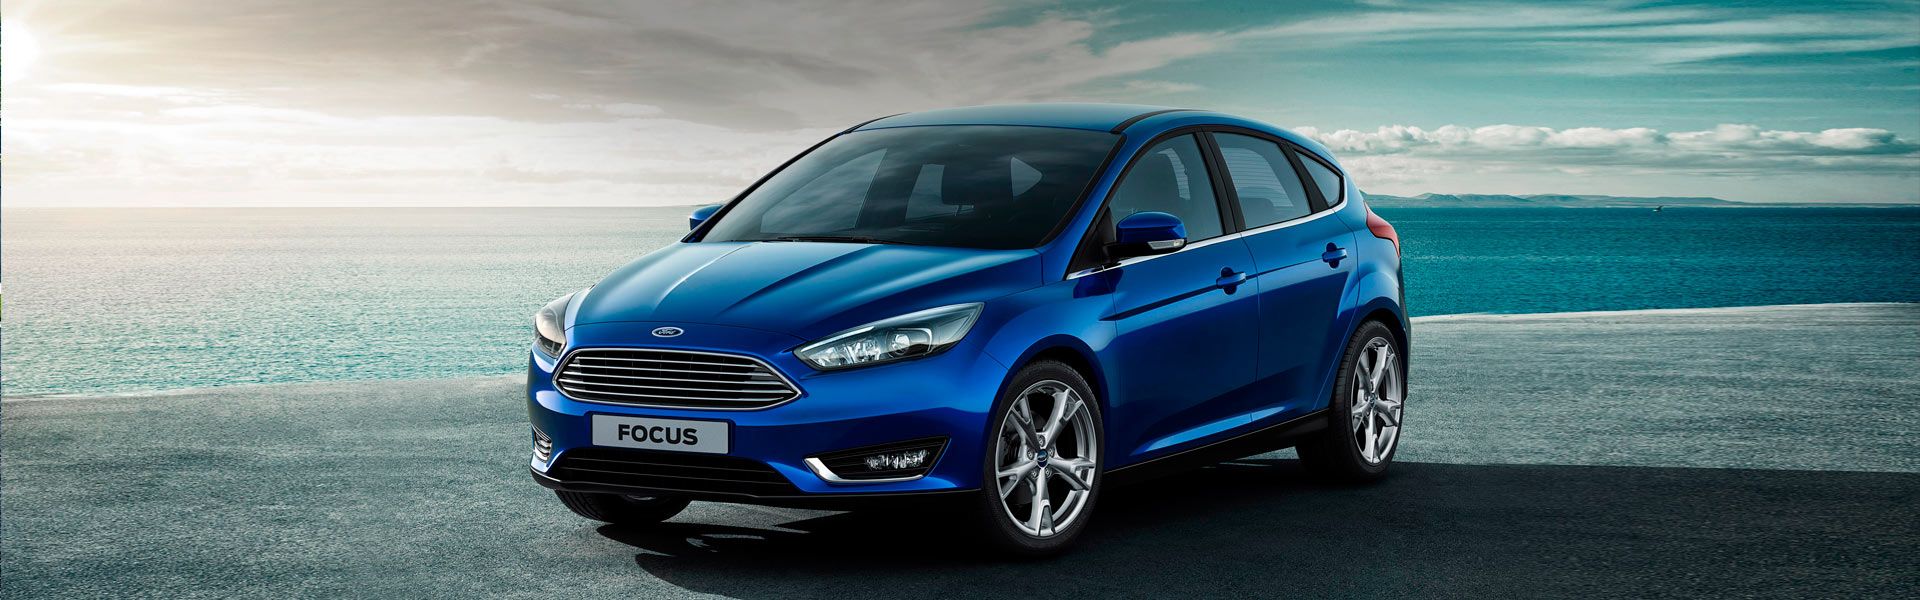 Ремонт раздатки Ford Focus